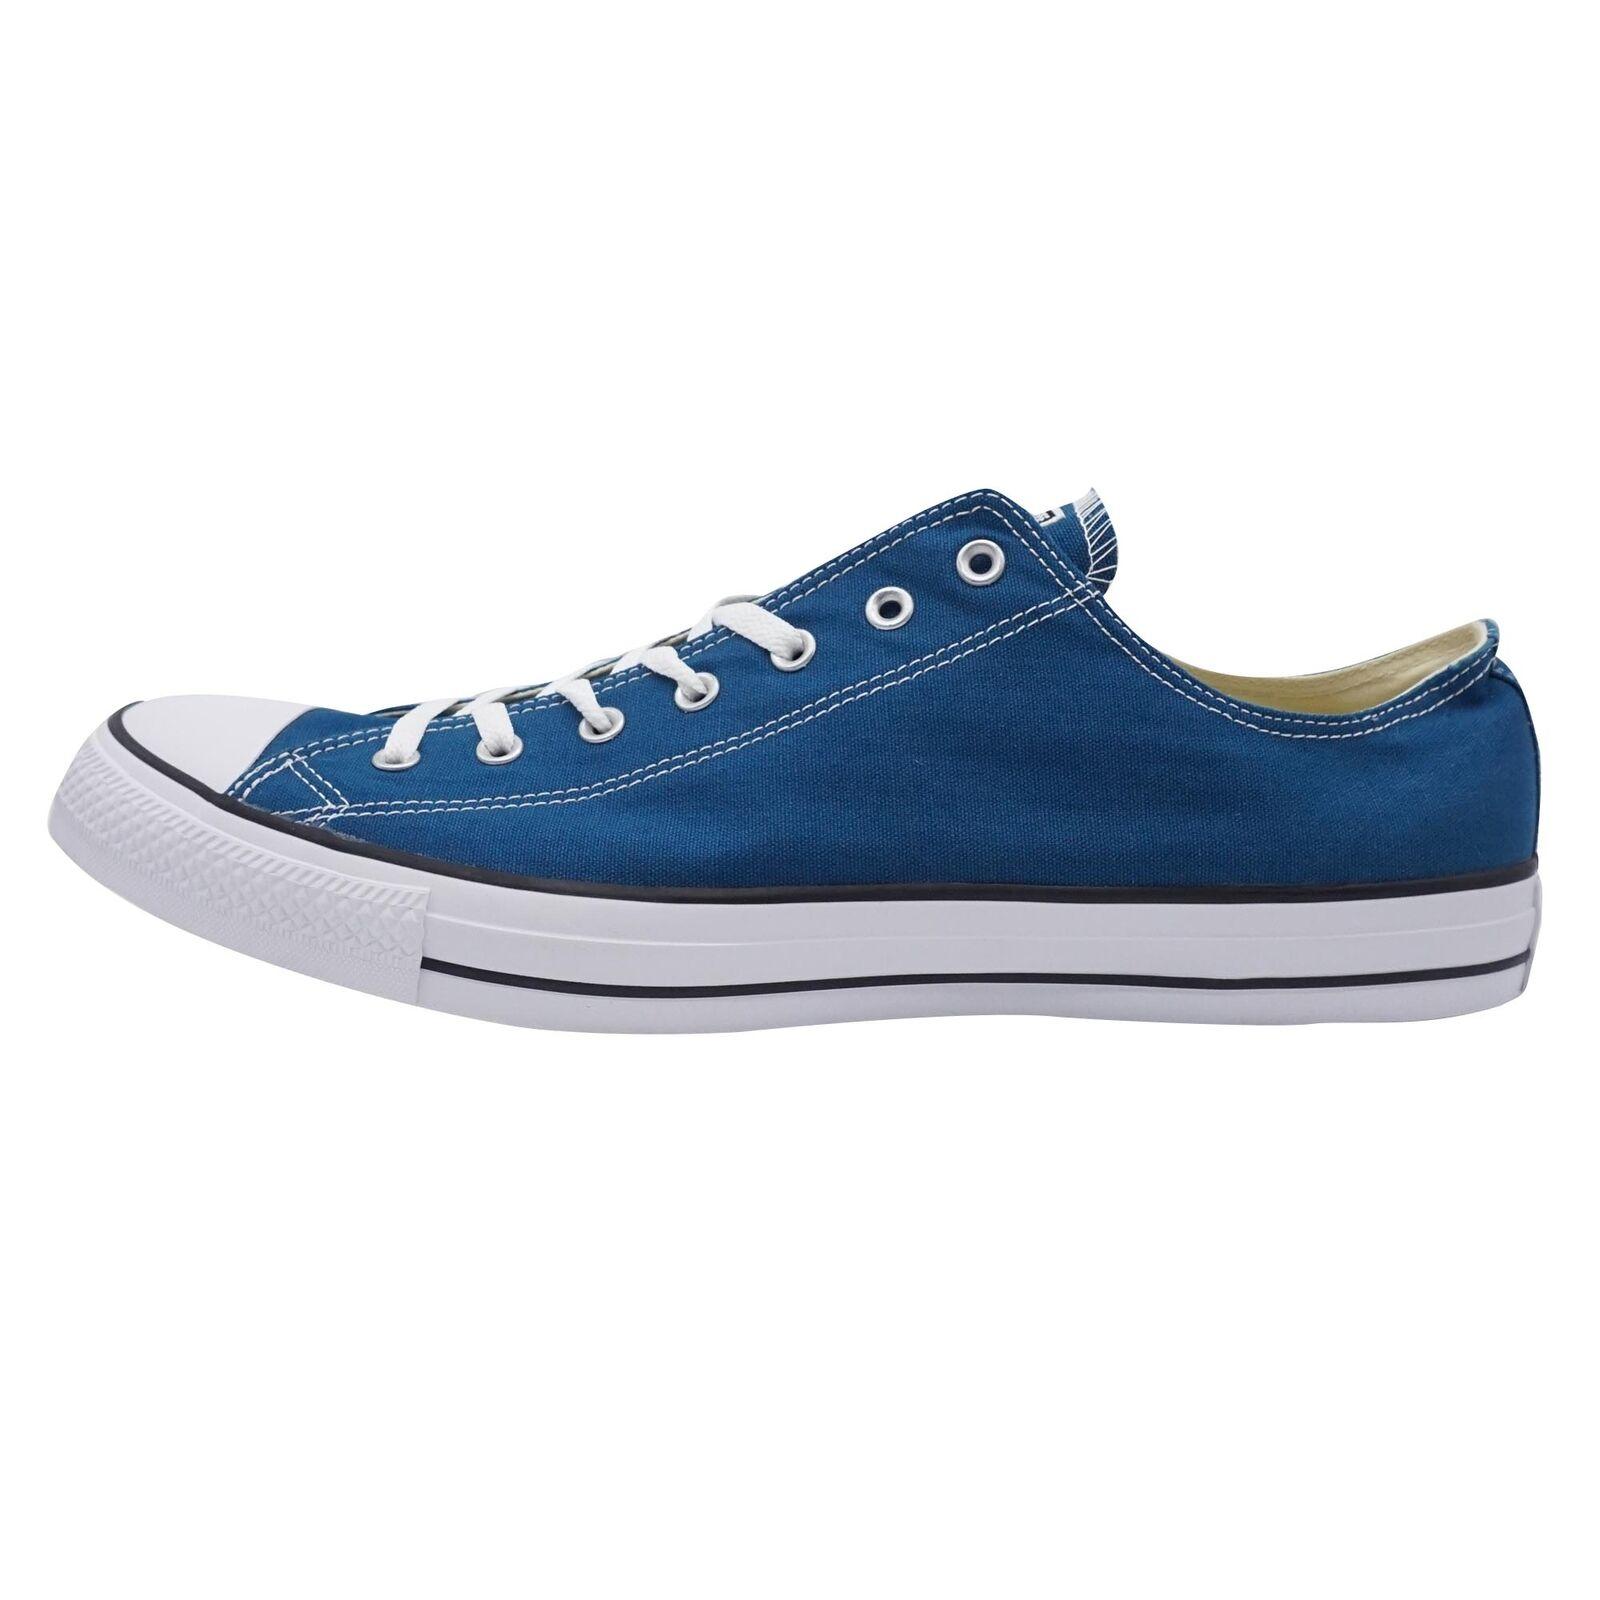 Converse Chuck Taylor Bll Star Ox Unisex Schuhe Sneaker Übergrößen blau XXL